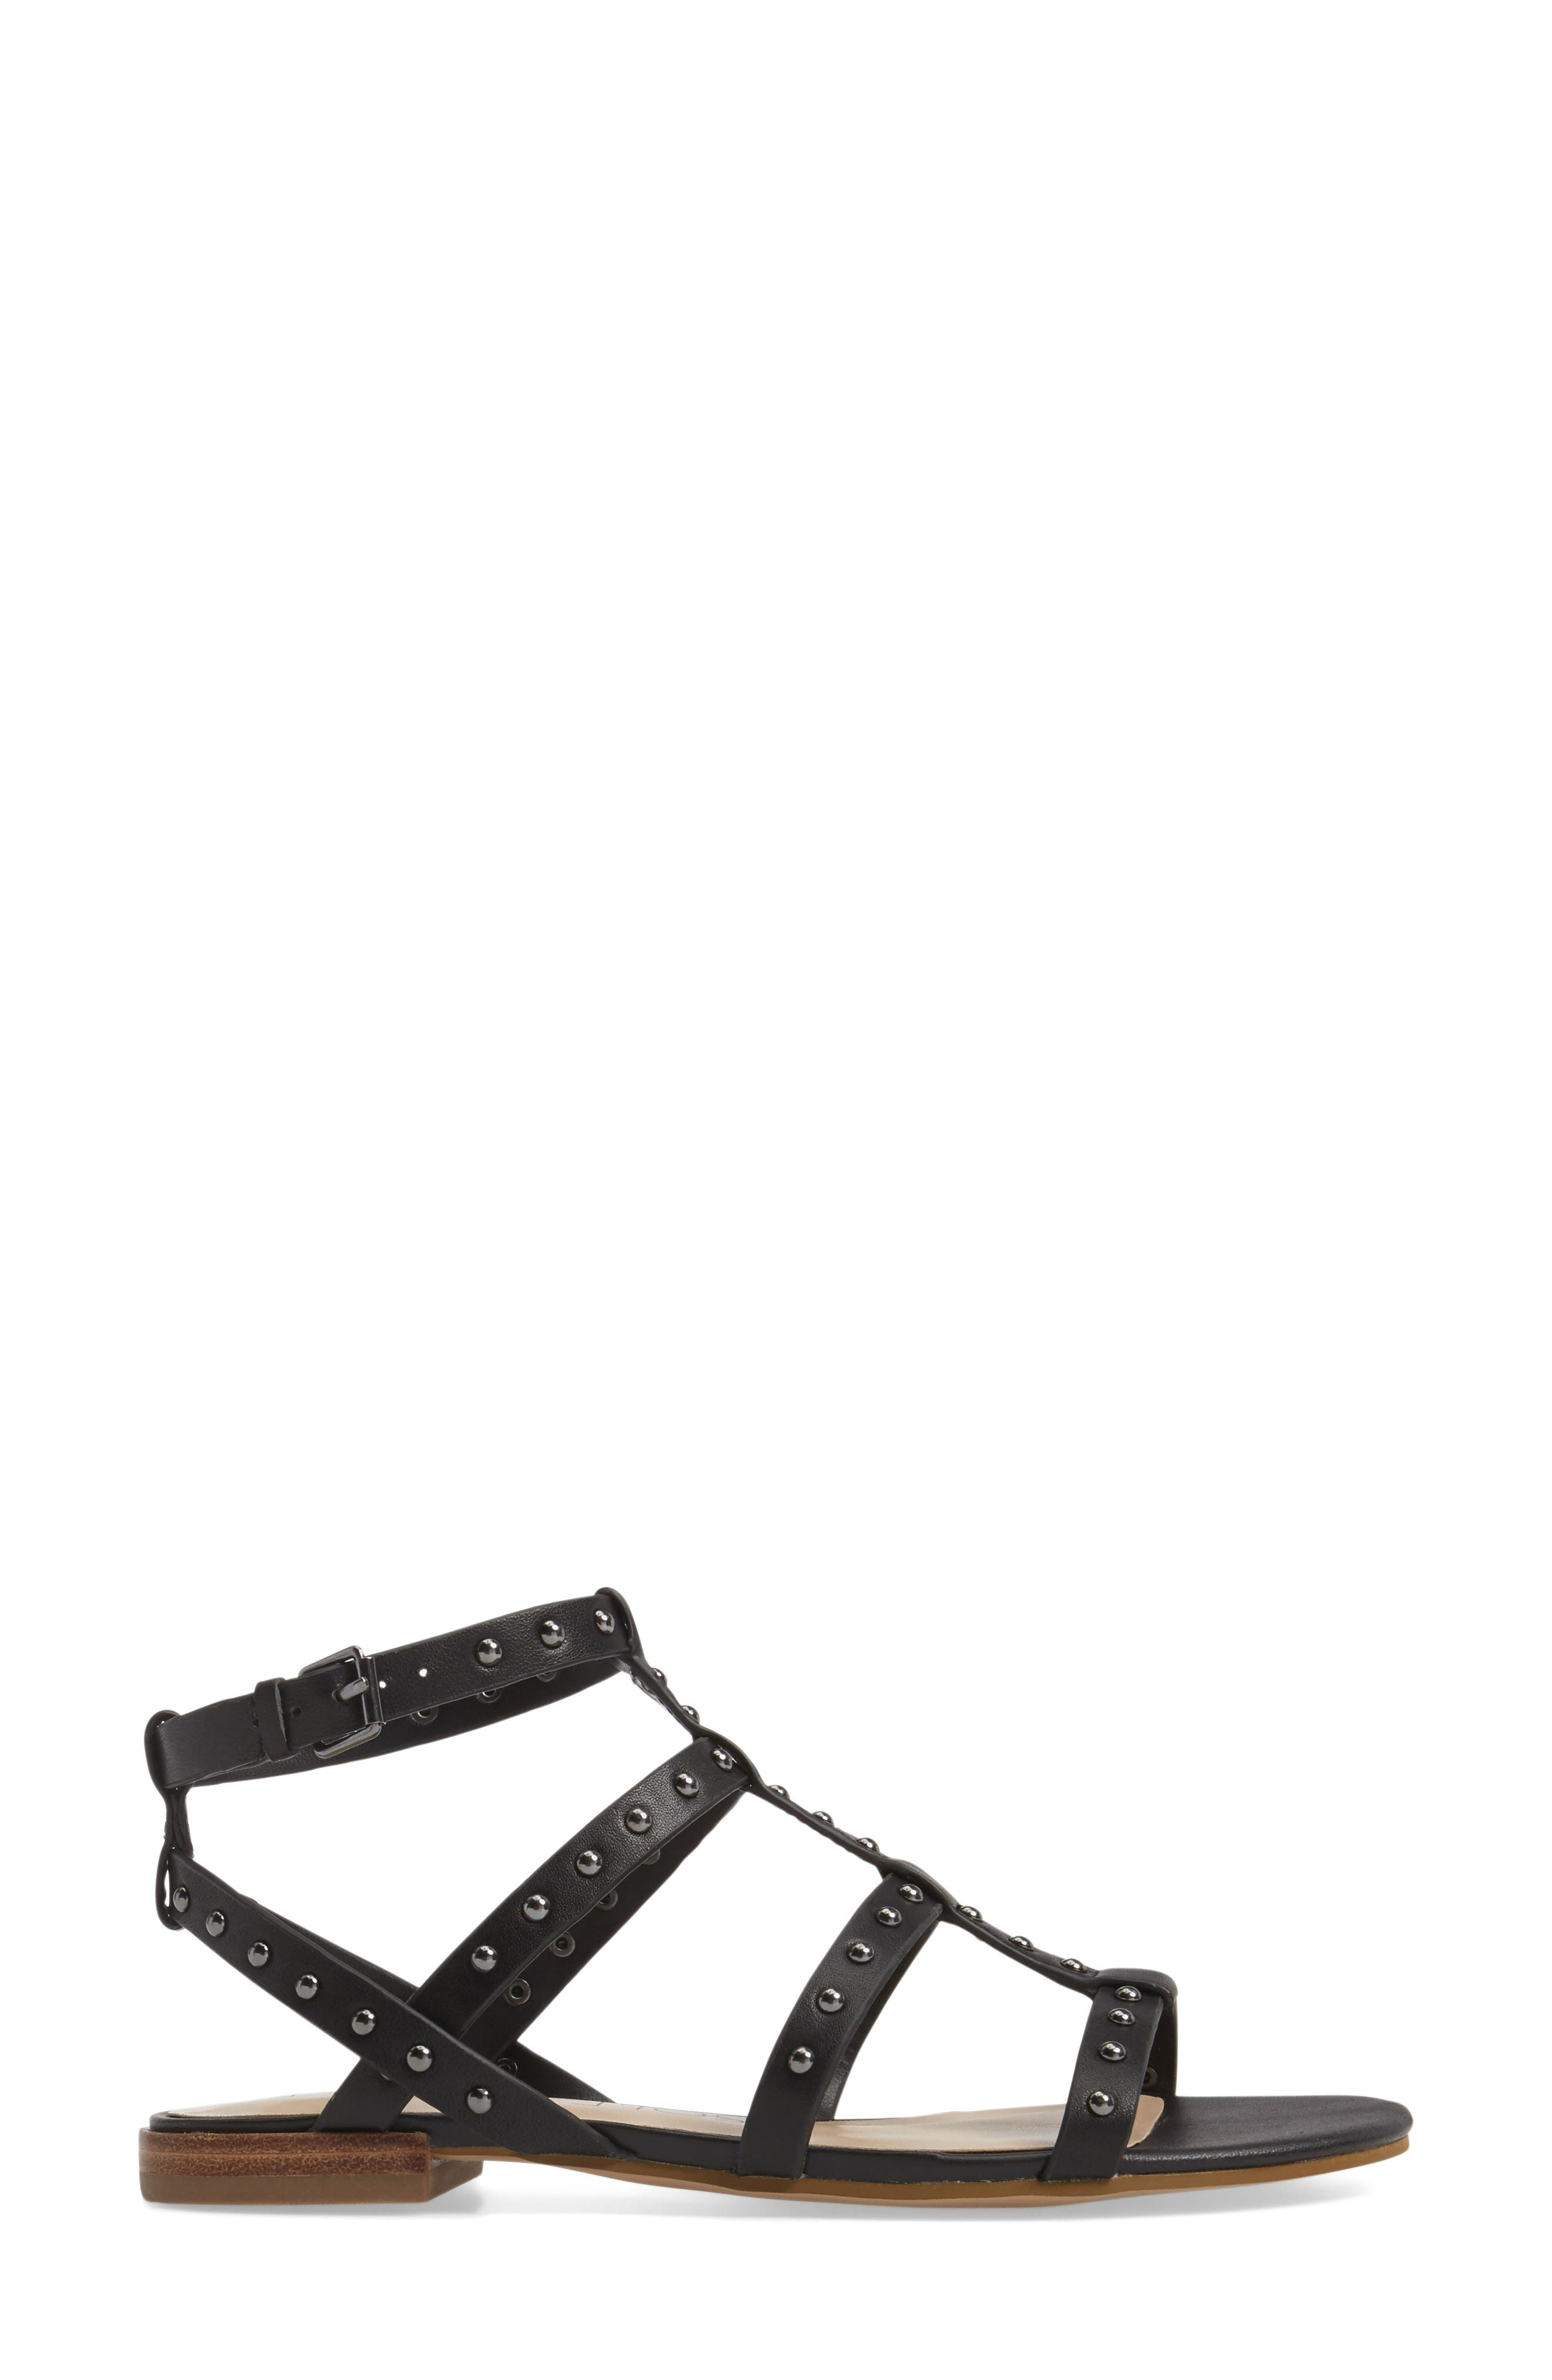 Celine Sandal,                             Alternate thumbnail 3, color,                             Black Leather